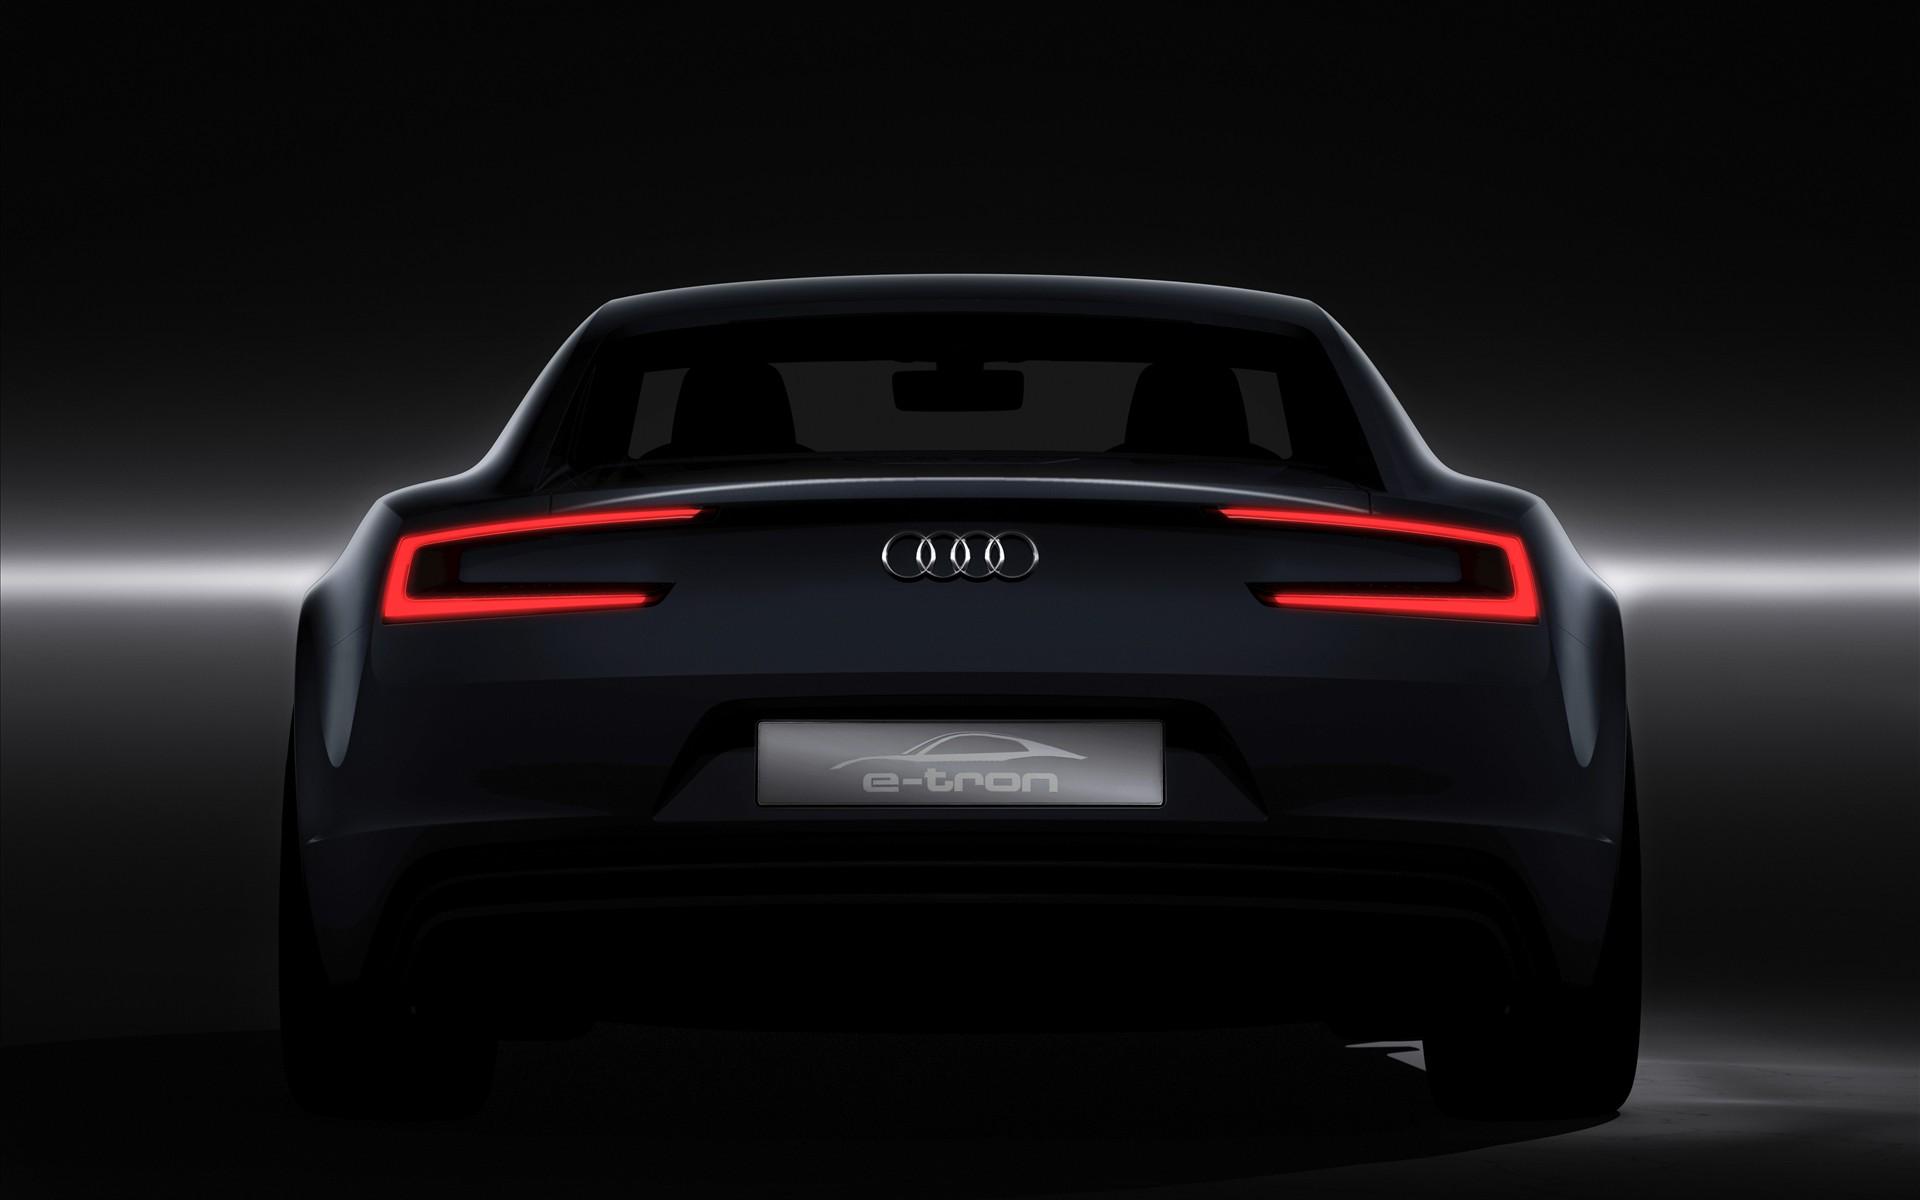 Audi e tron 10 Wallpapers HD Wallpapers 1920x1200